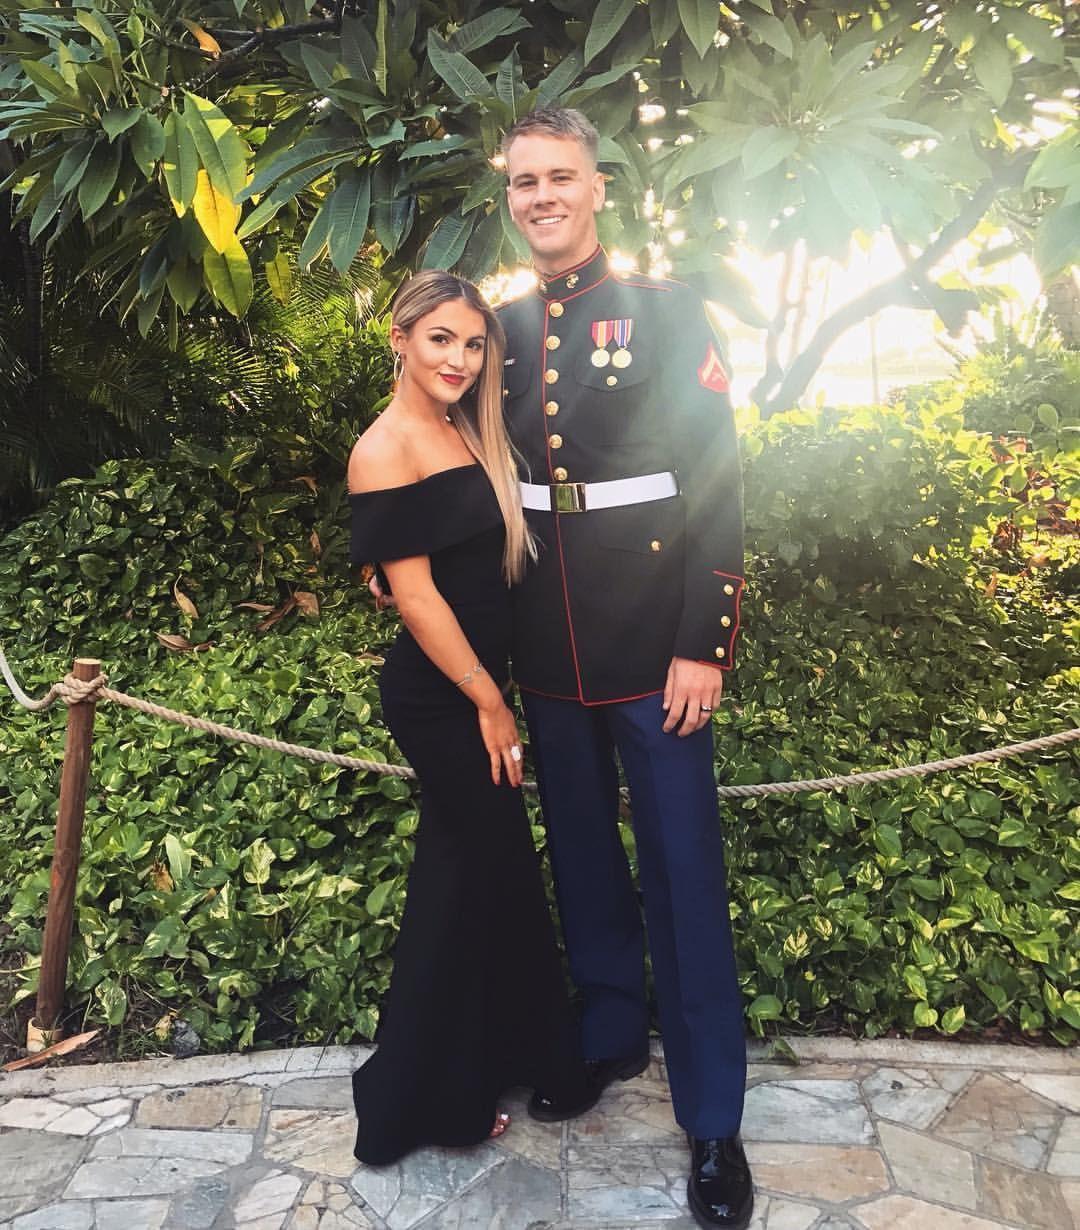 Marine Corps Ball Dress. Marine Corps Ball. 1,251 Likes